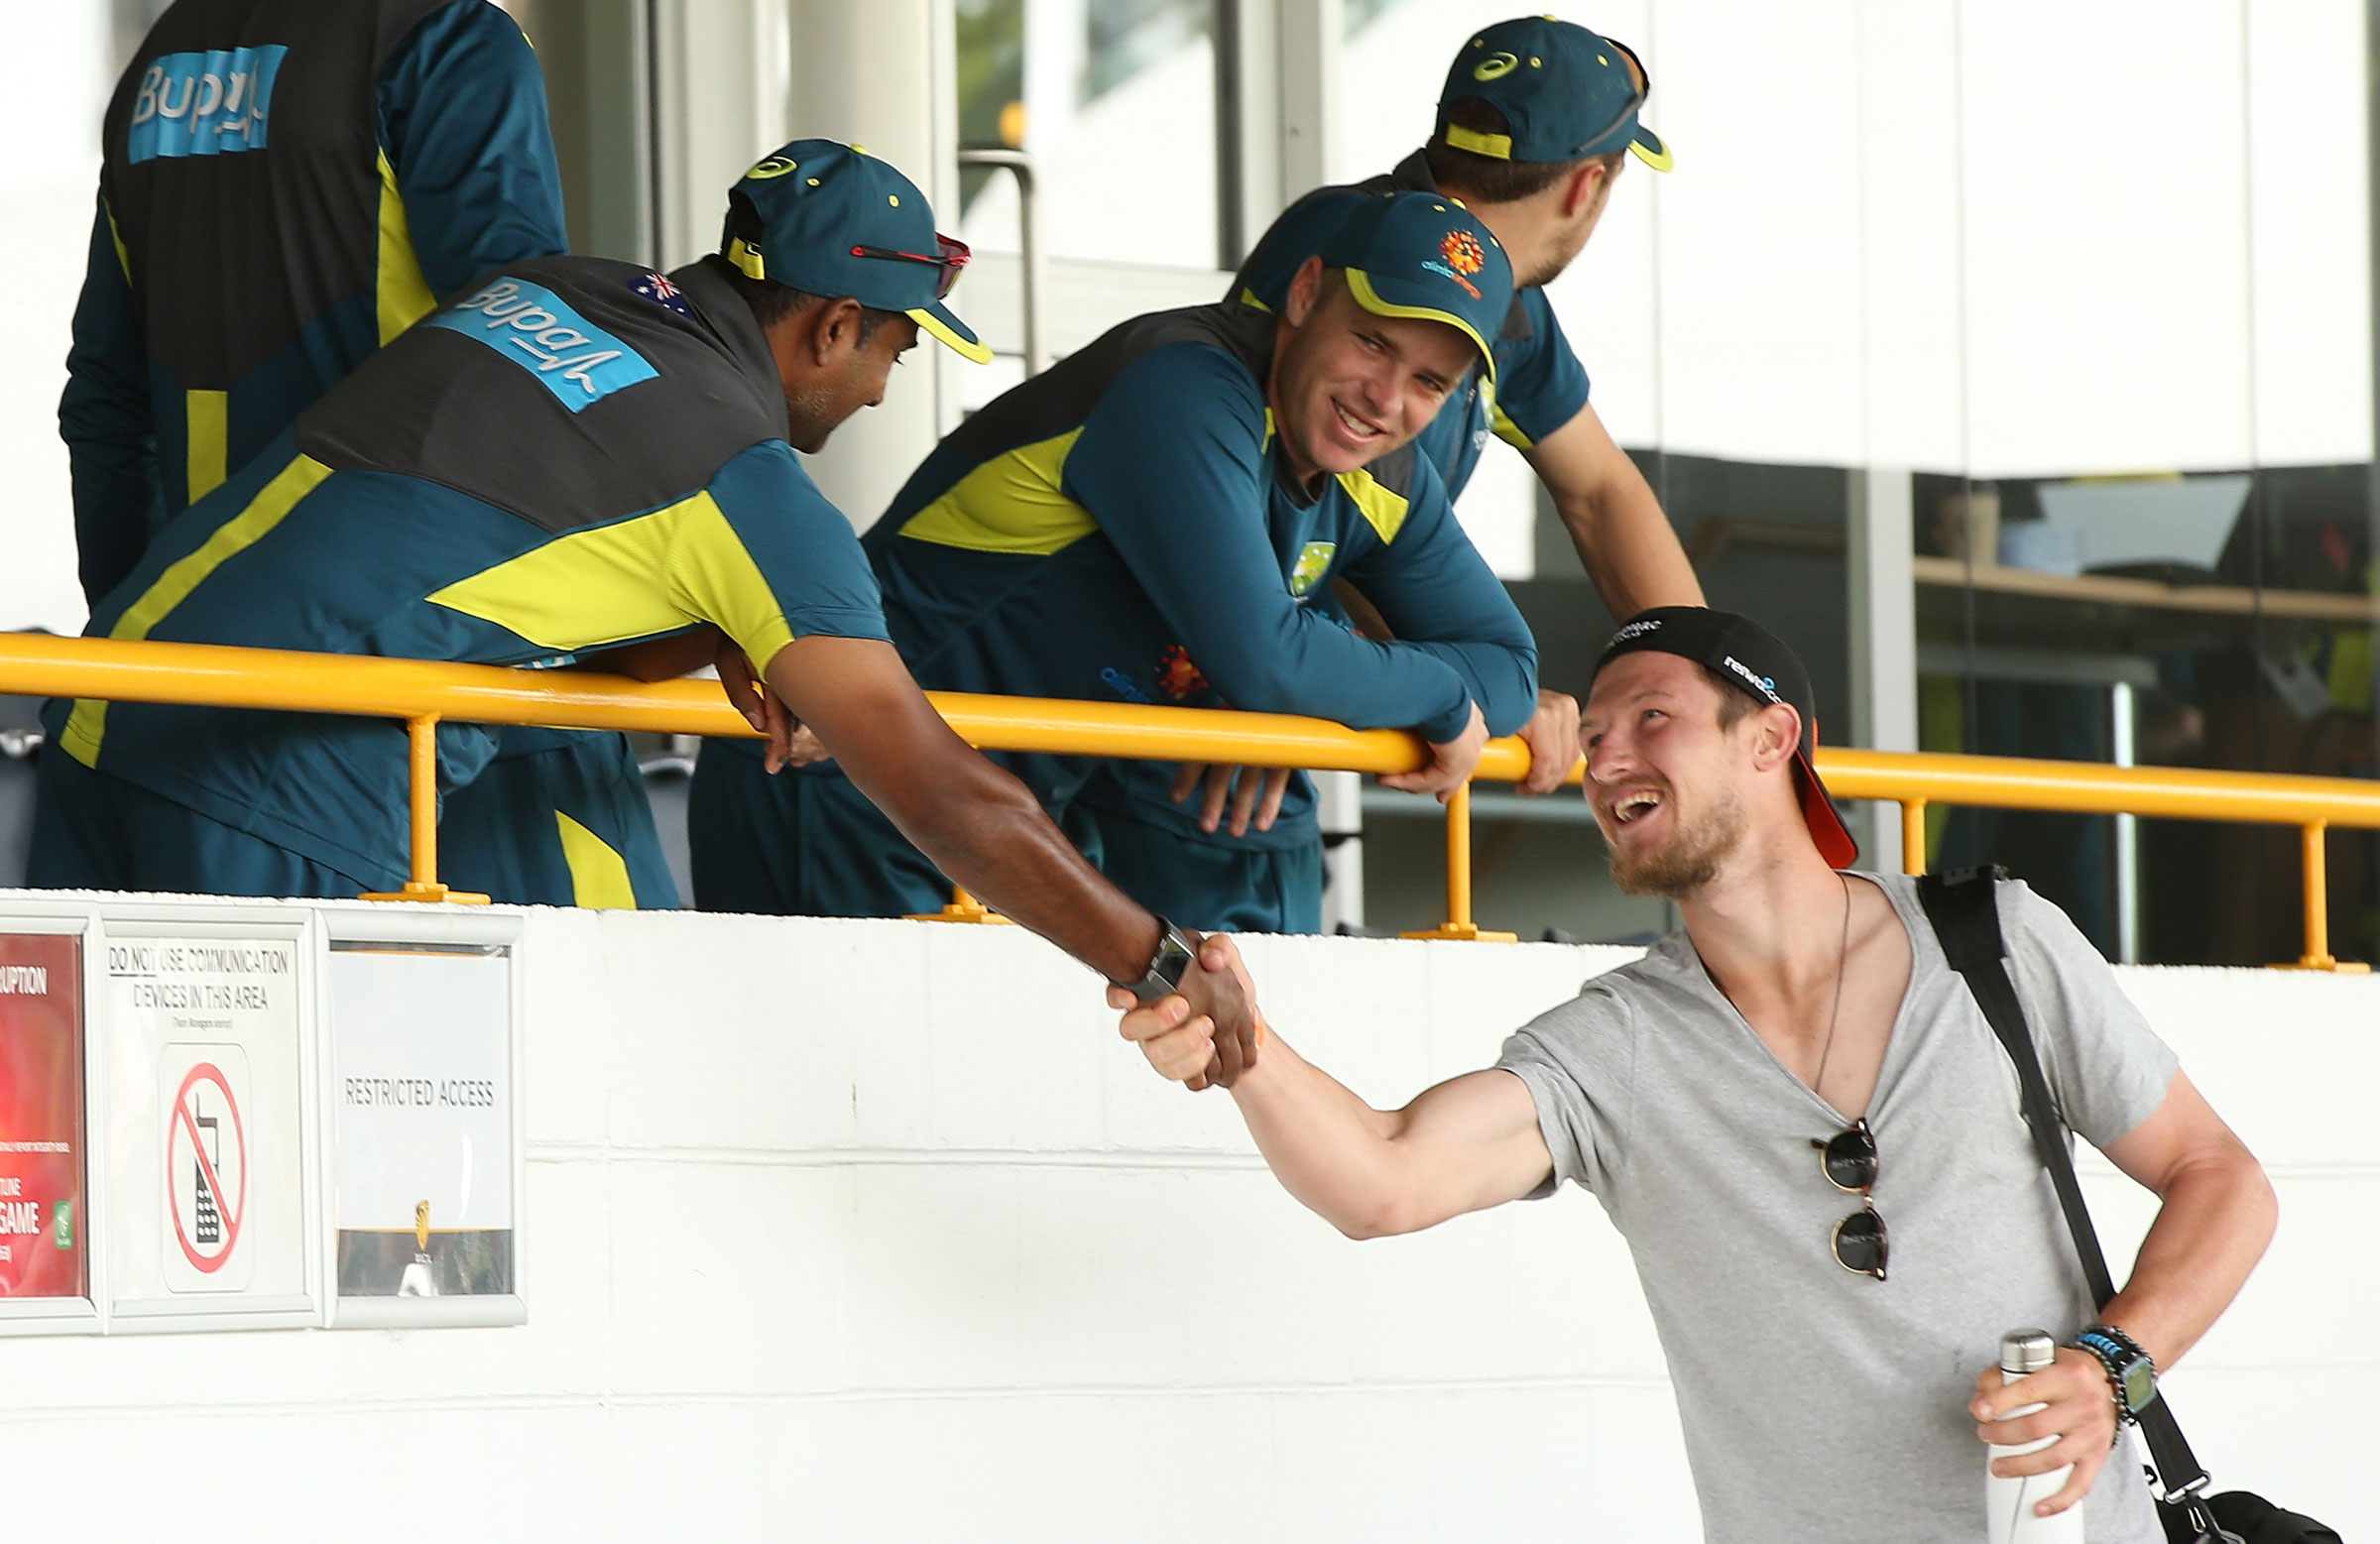 Bancroft in happier place as return nears - cricket.com.au image